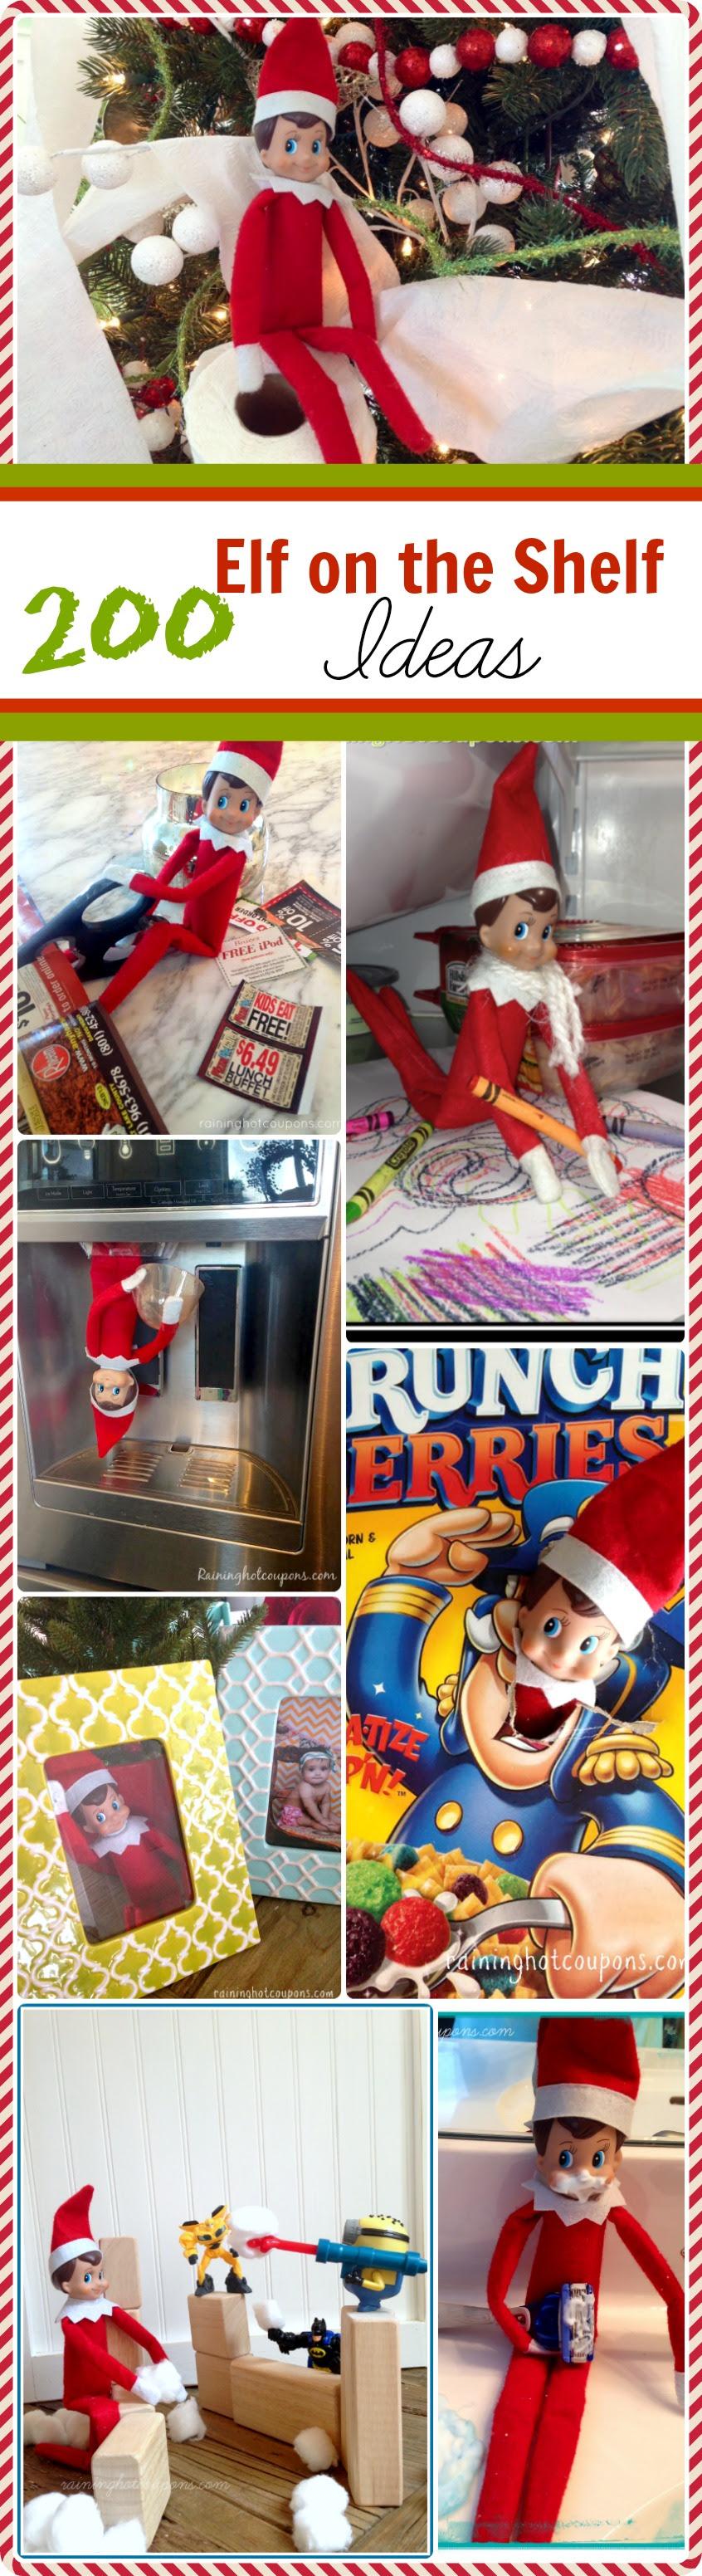 elf3 200 Easy Elf on the Shelf Ideas